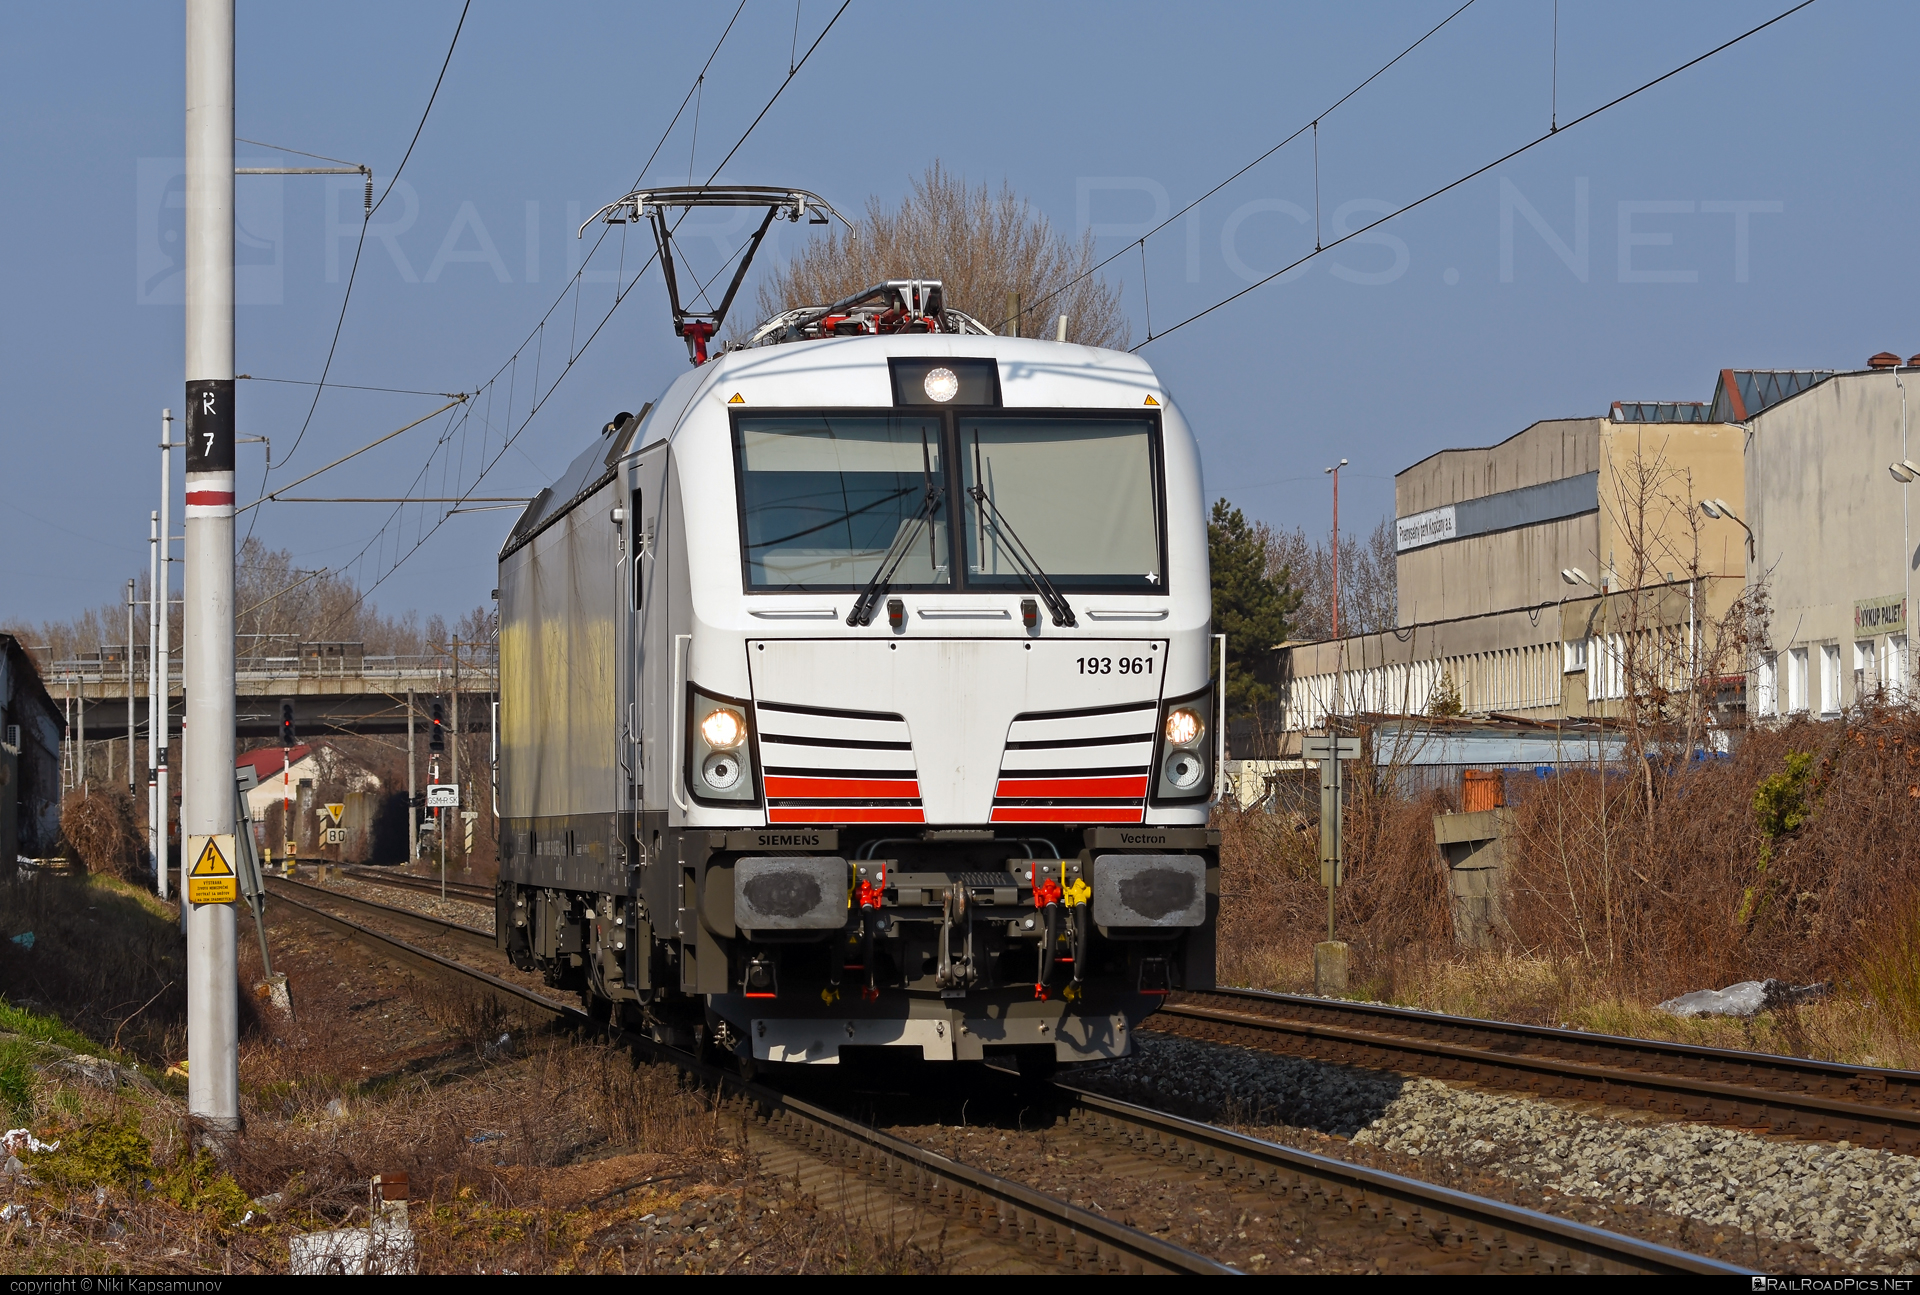 Siemens Vectron MS - 193 961 operated by Salzburger Eisenbahn Transportlogistik GmbH #SalzburgerEisenbahnTransportlogistik #SalzburgerEisenbahnTransportlogistikGmbH #SiemensMobility #SiemensMobilityGmbH #setg #siemens #siemensvectron #siemensvectronms #vectron #vectronms